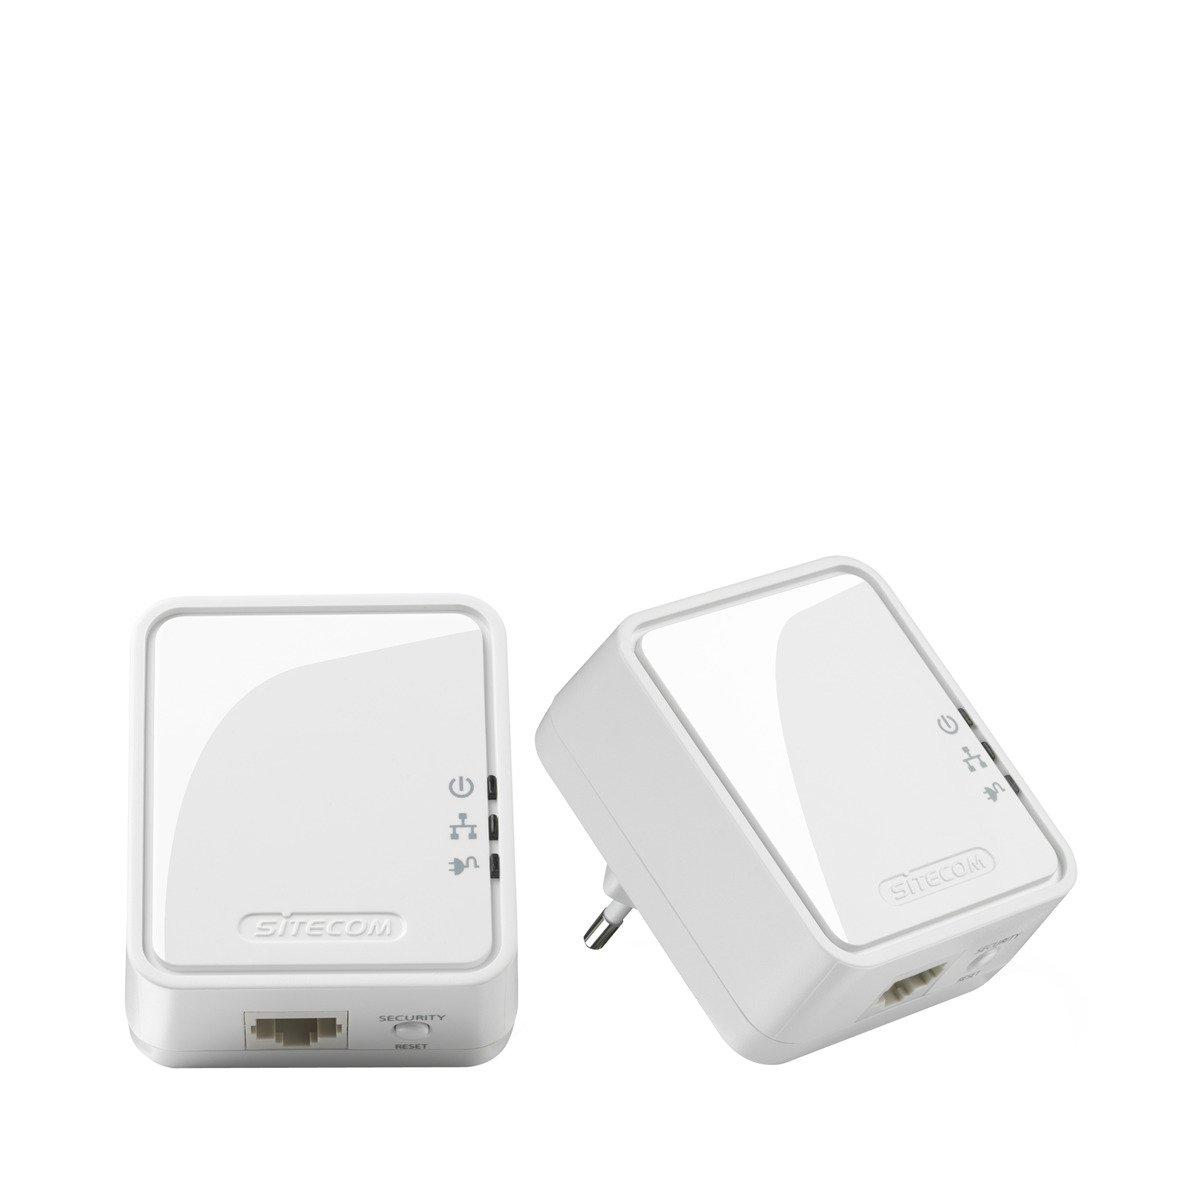 Kit adaptadores PLC Sitecom Mini Homeplug LN-551 500 Mbps